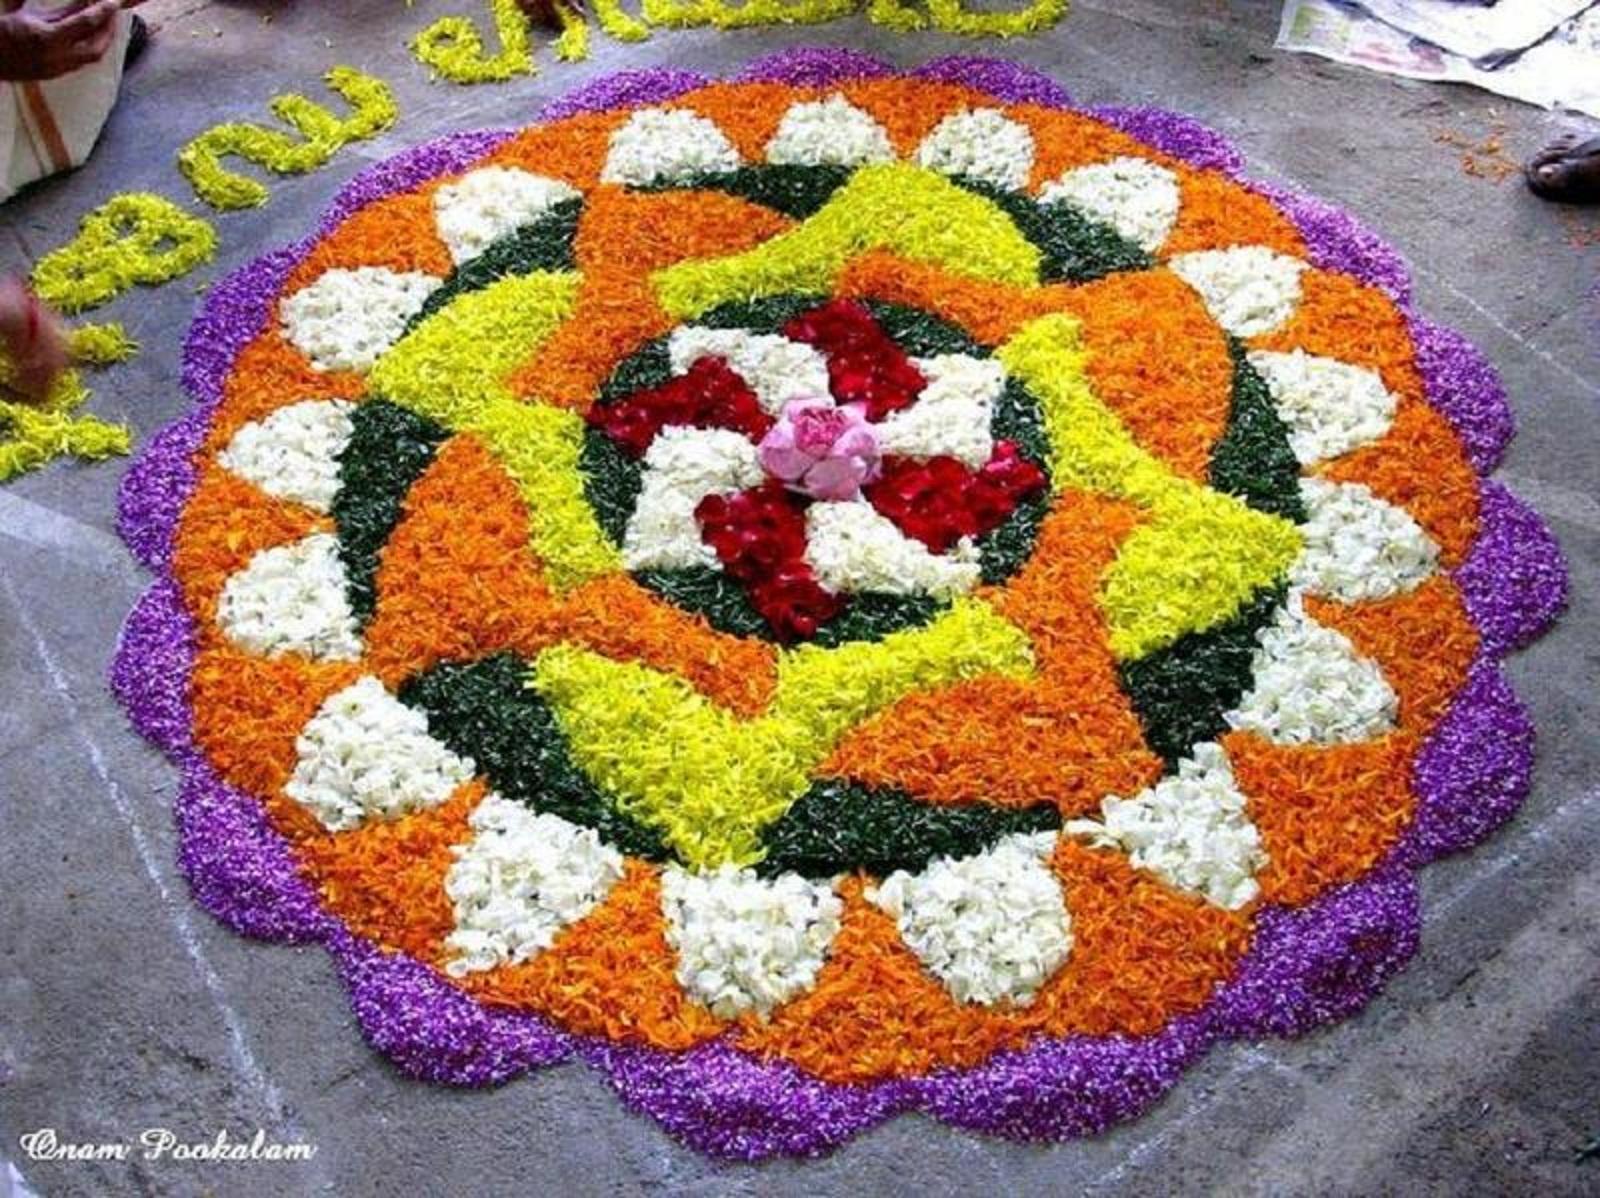 essay on onam essay on onamnothing found for essay on onam a festival of southern in